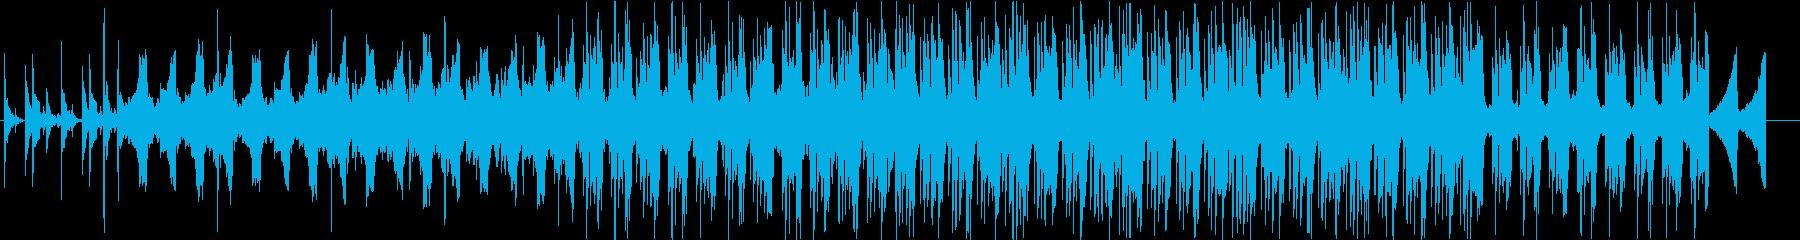 Lo-Fiな感じのエレクトロニカの再生済みの波形